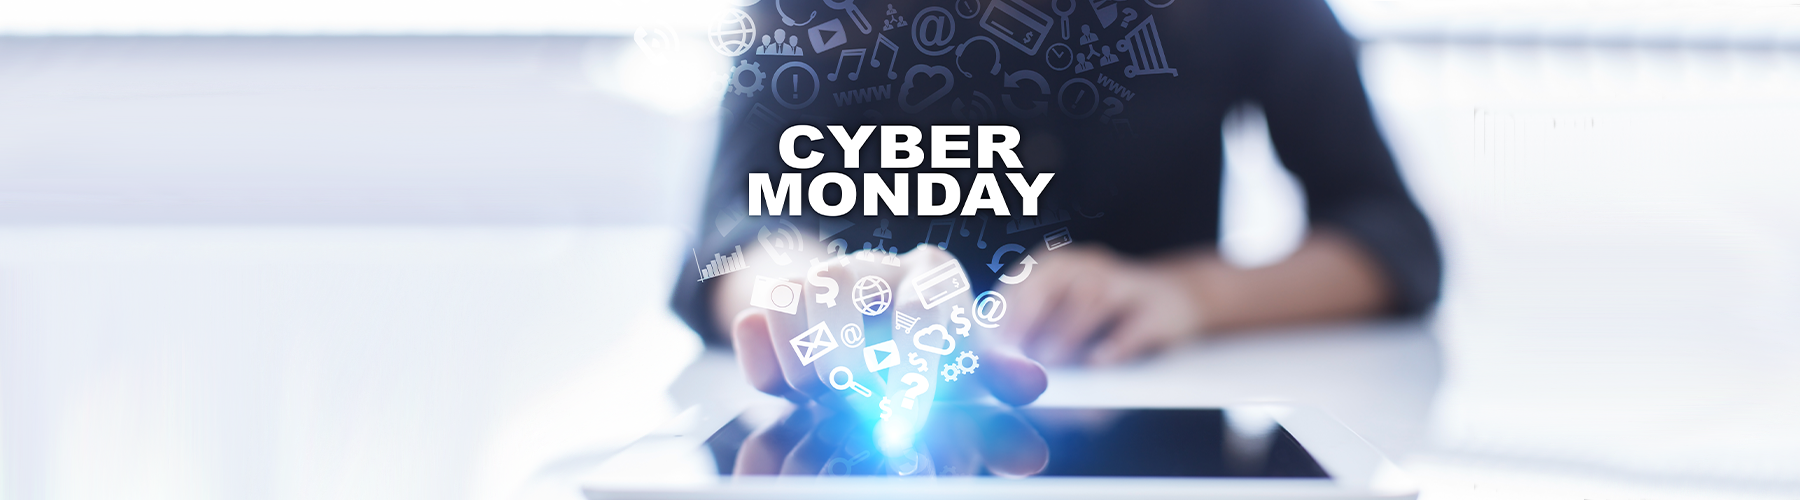 10 Cyber Monday Campaign Ideas